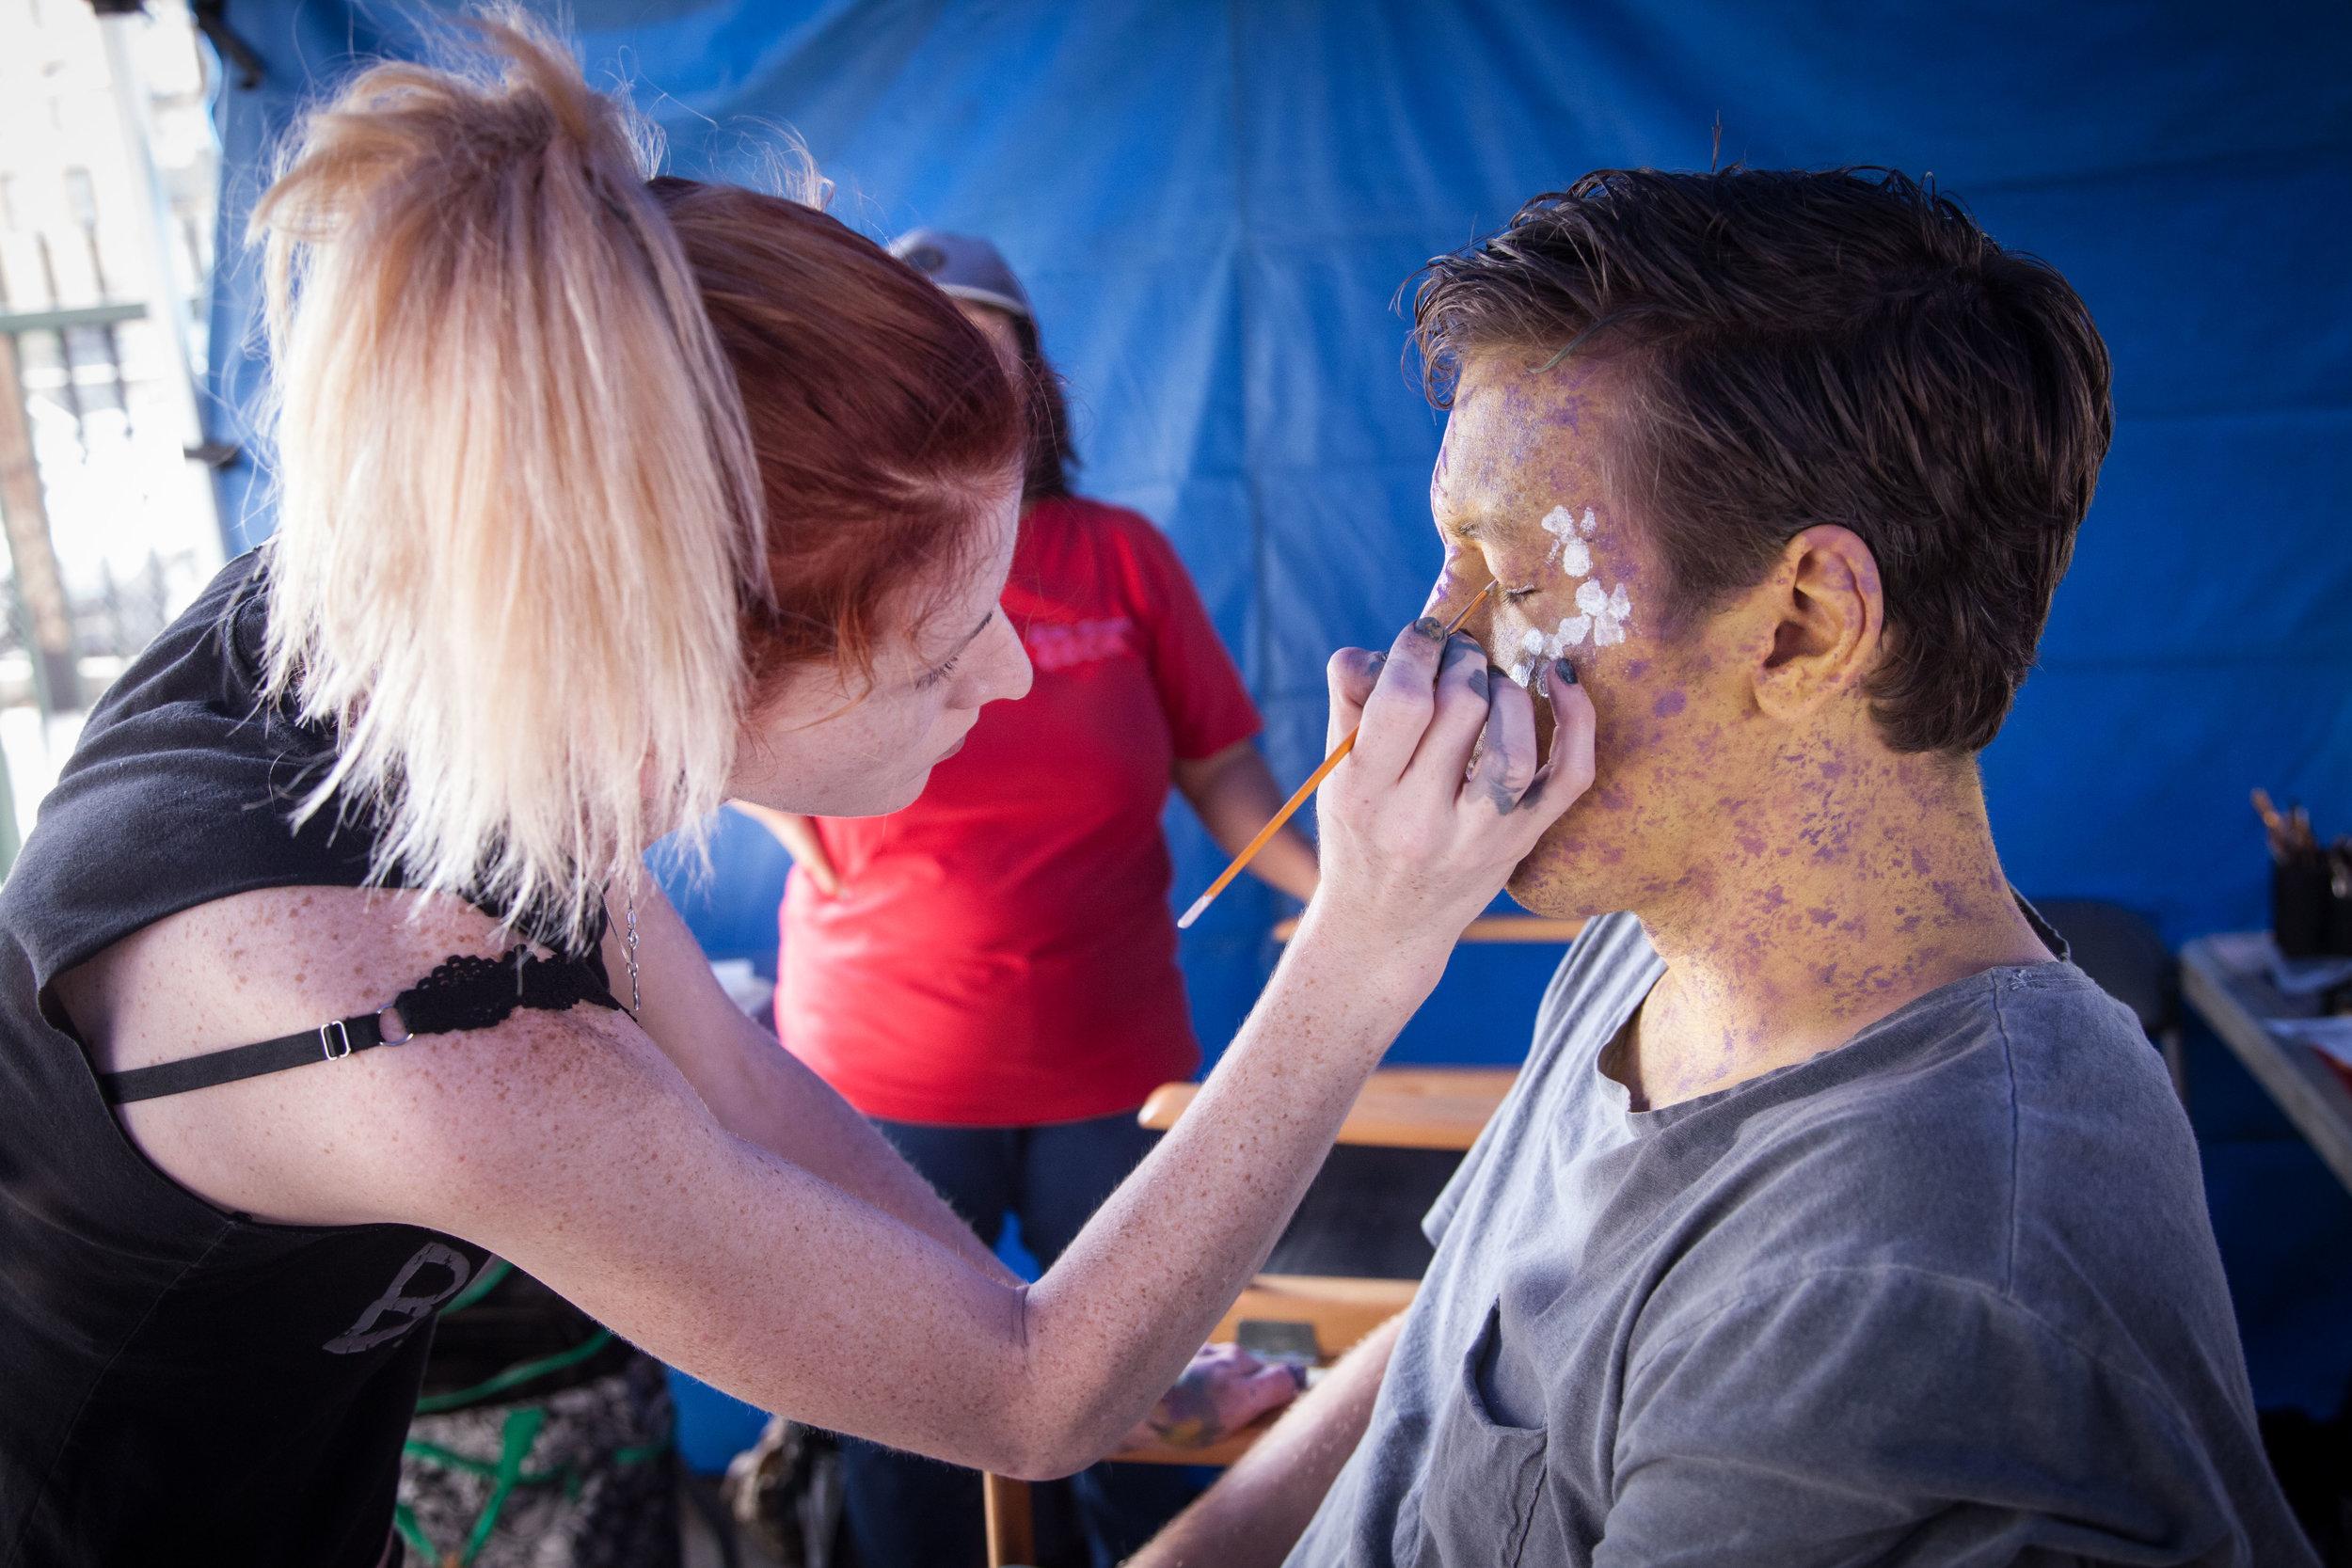 Miss 2059- Season 2, 2017  Production: New Form Digital & Go90  Makeup Dept. Head: Michelle Miller  SFX Makeup Dept. Head: Jim Ojala  Photo by: Will Akana